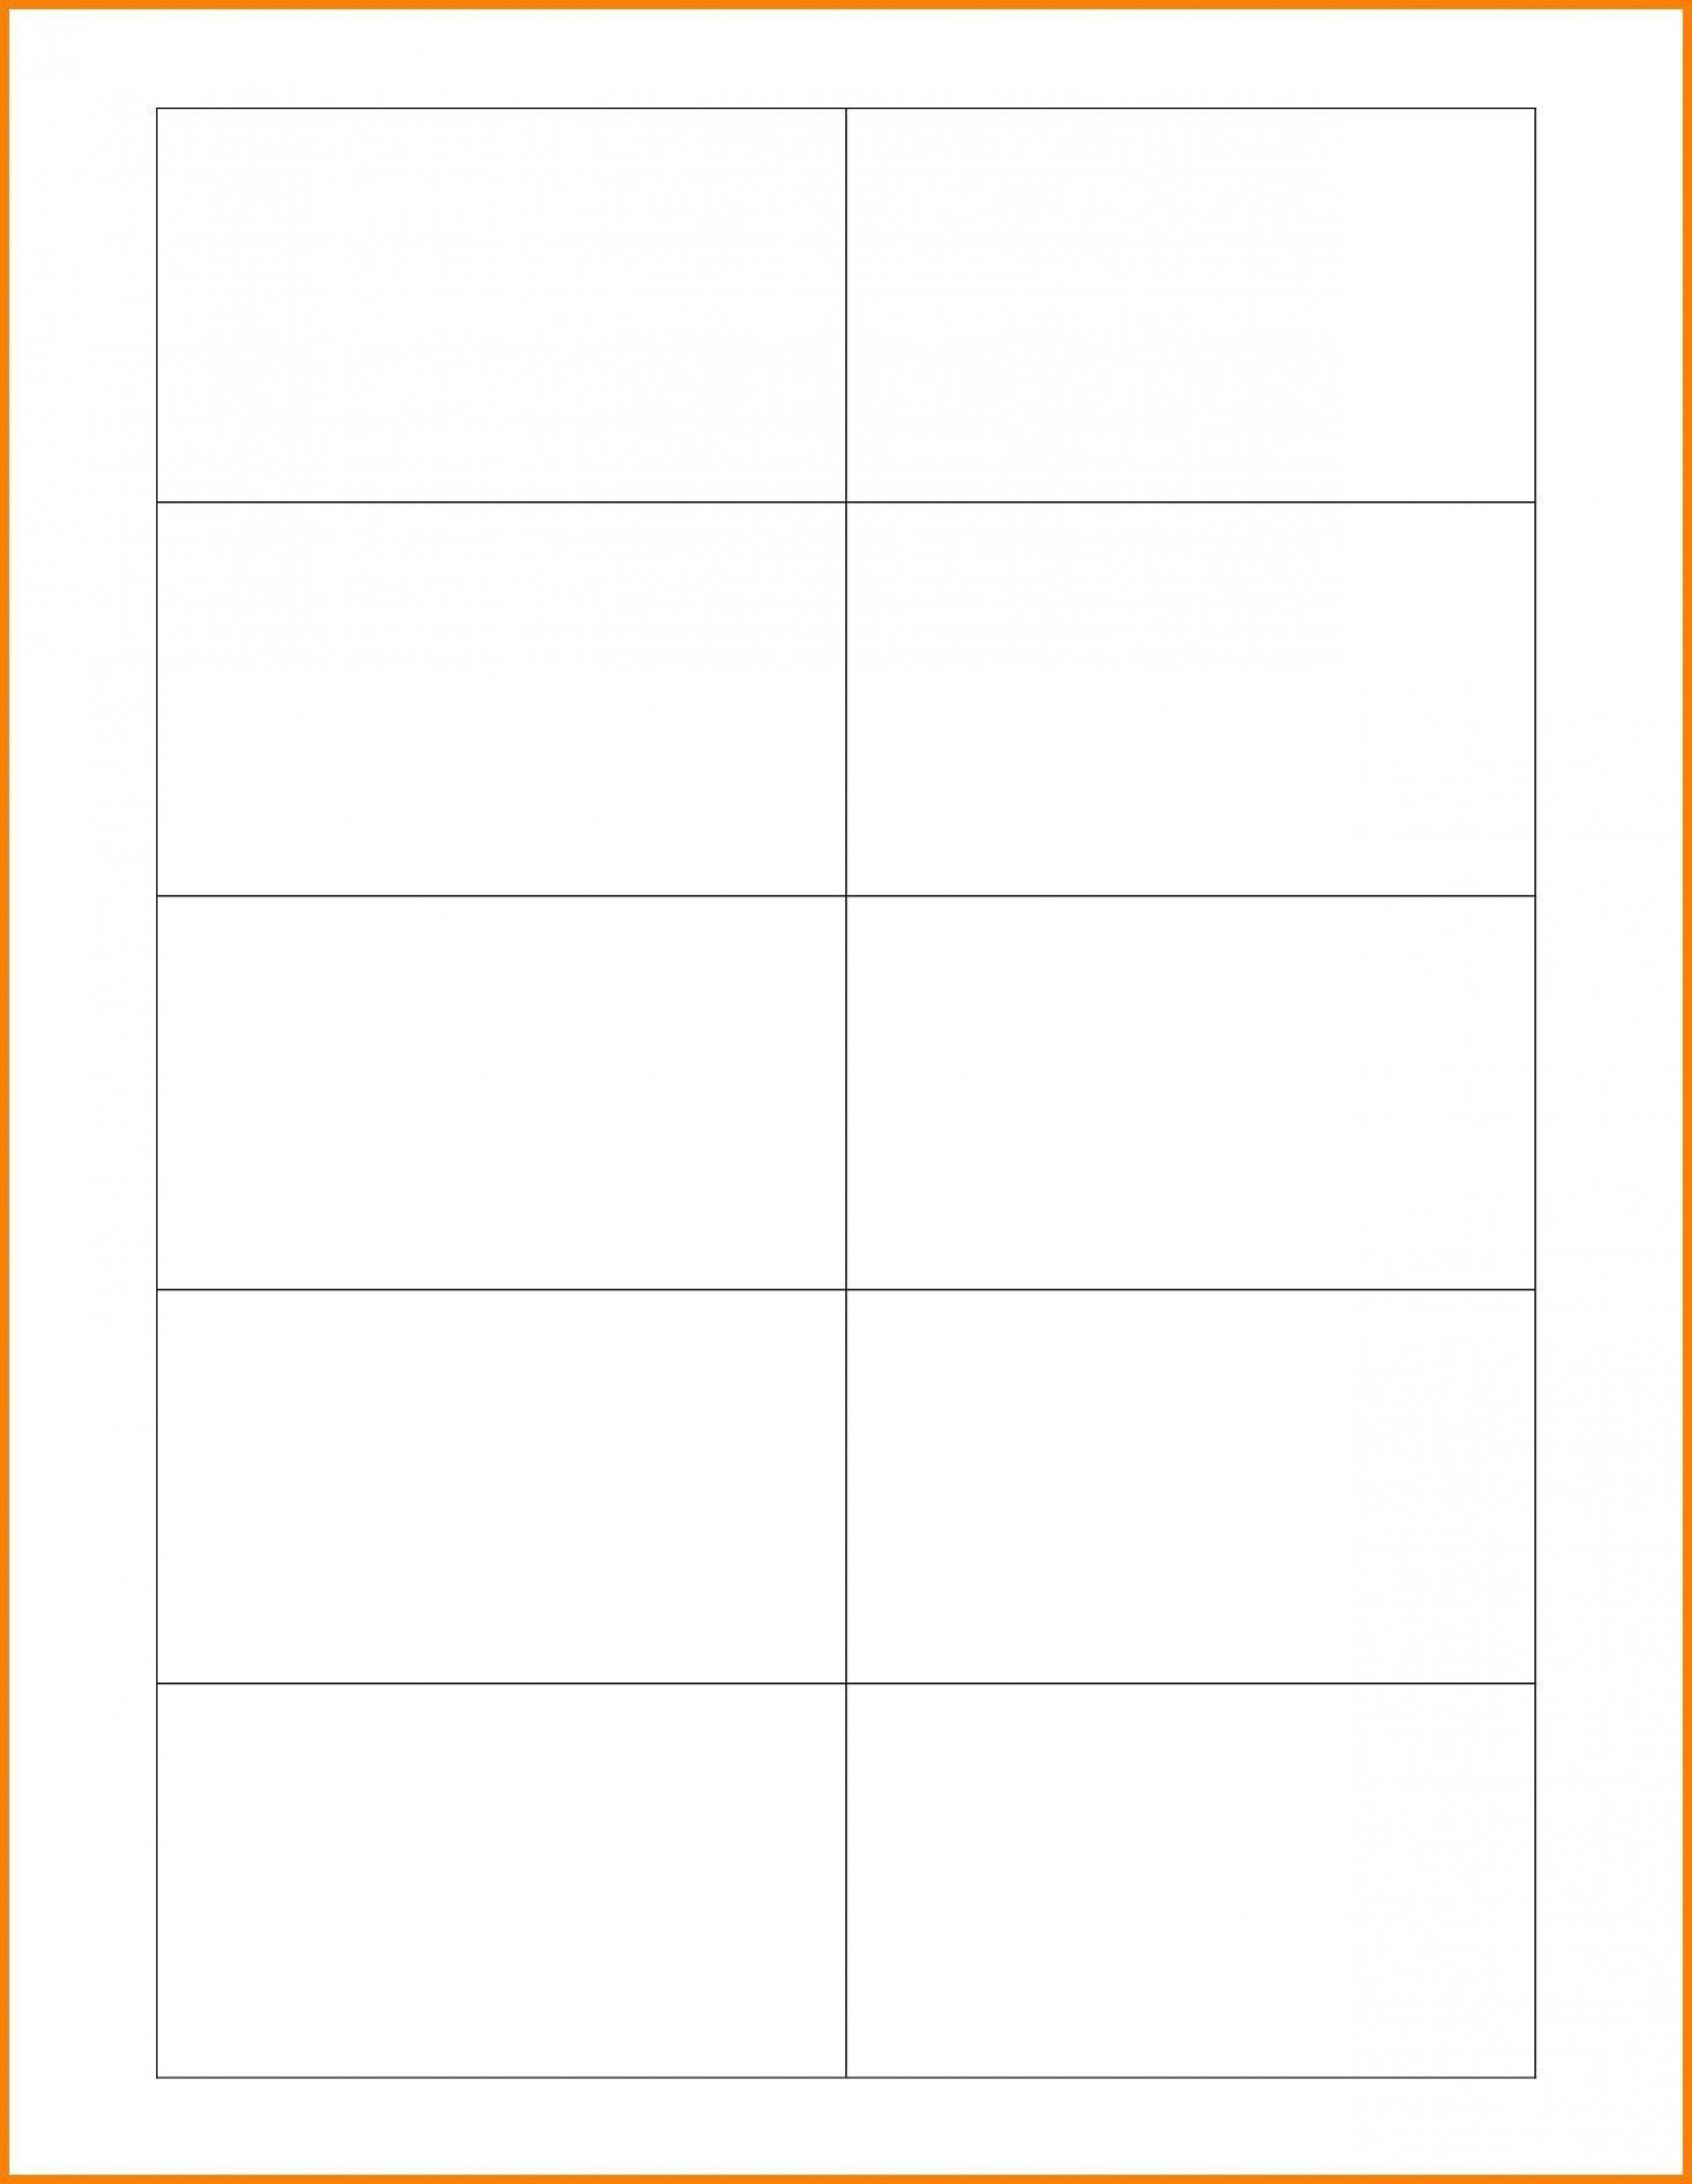 005 Impressive Free Printable Busines Card Template For Word Sample  Blank1920